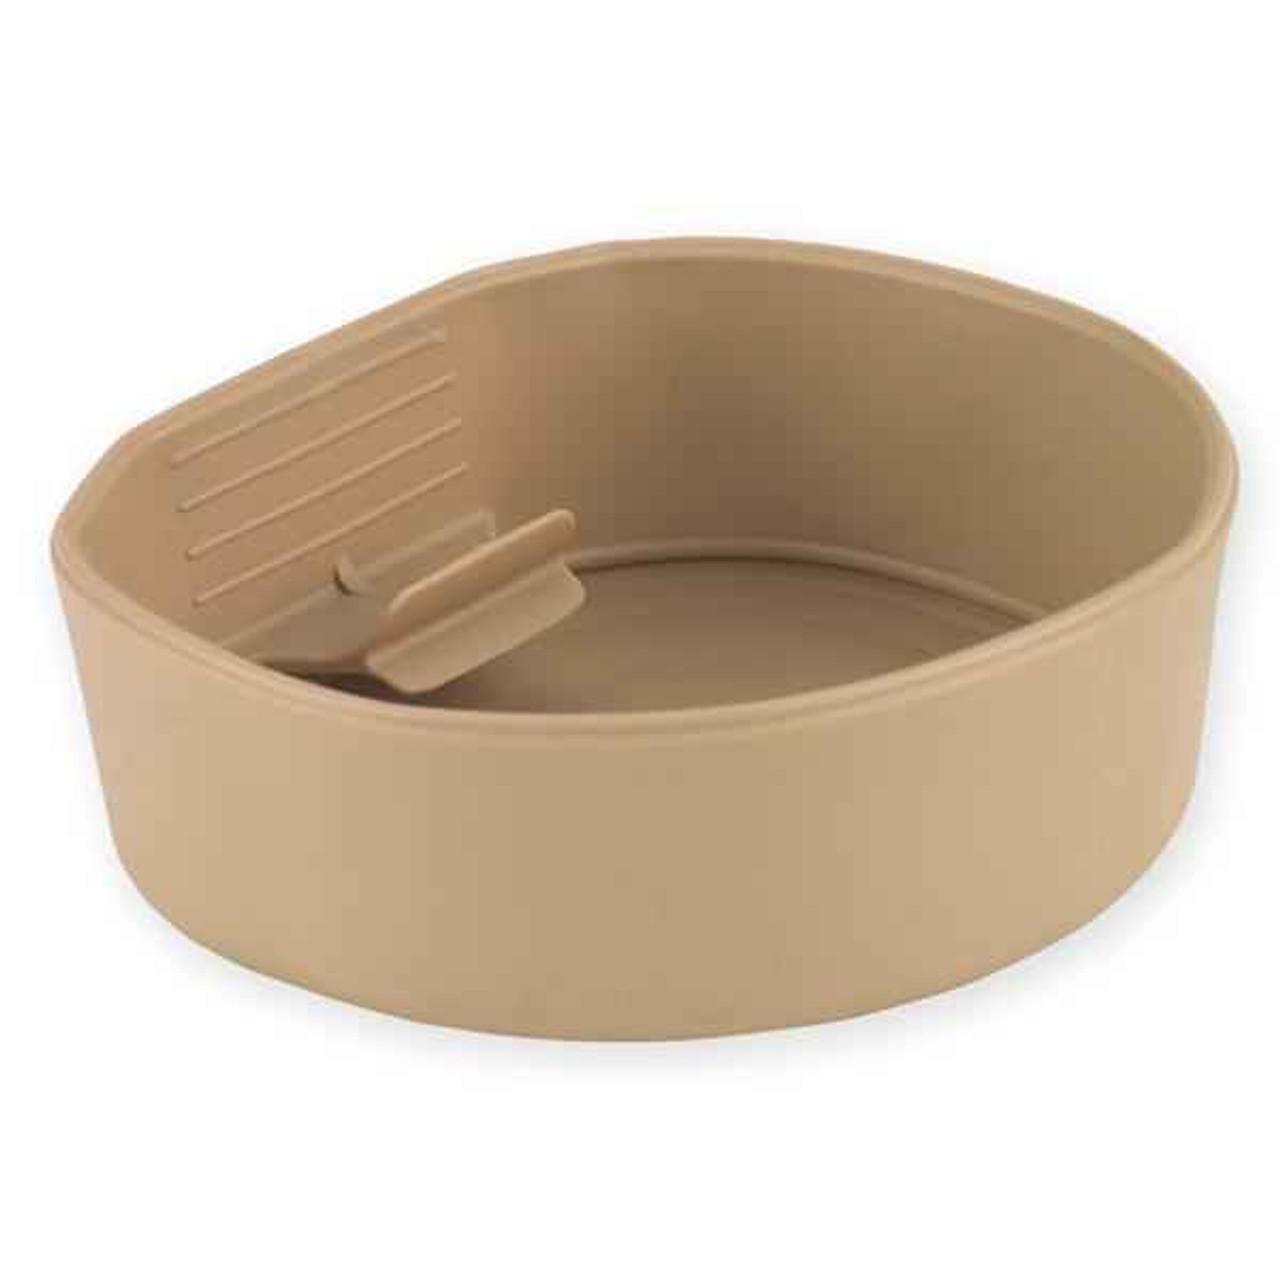 Wildo Fold-a-cup, Large, Tan